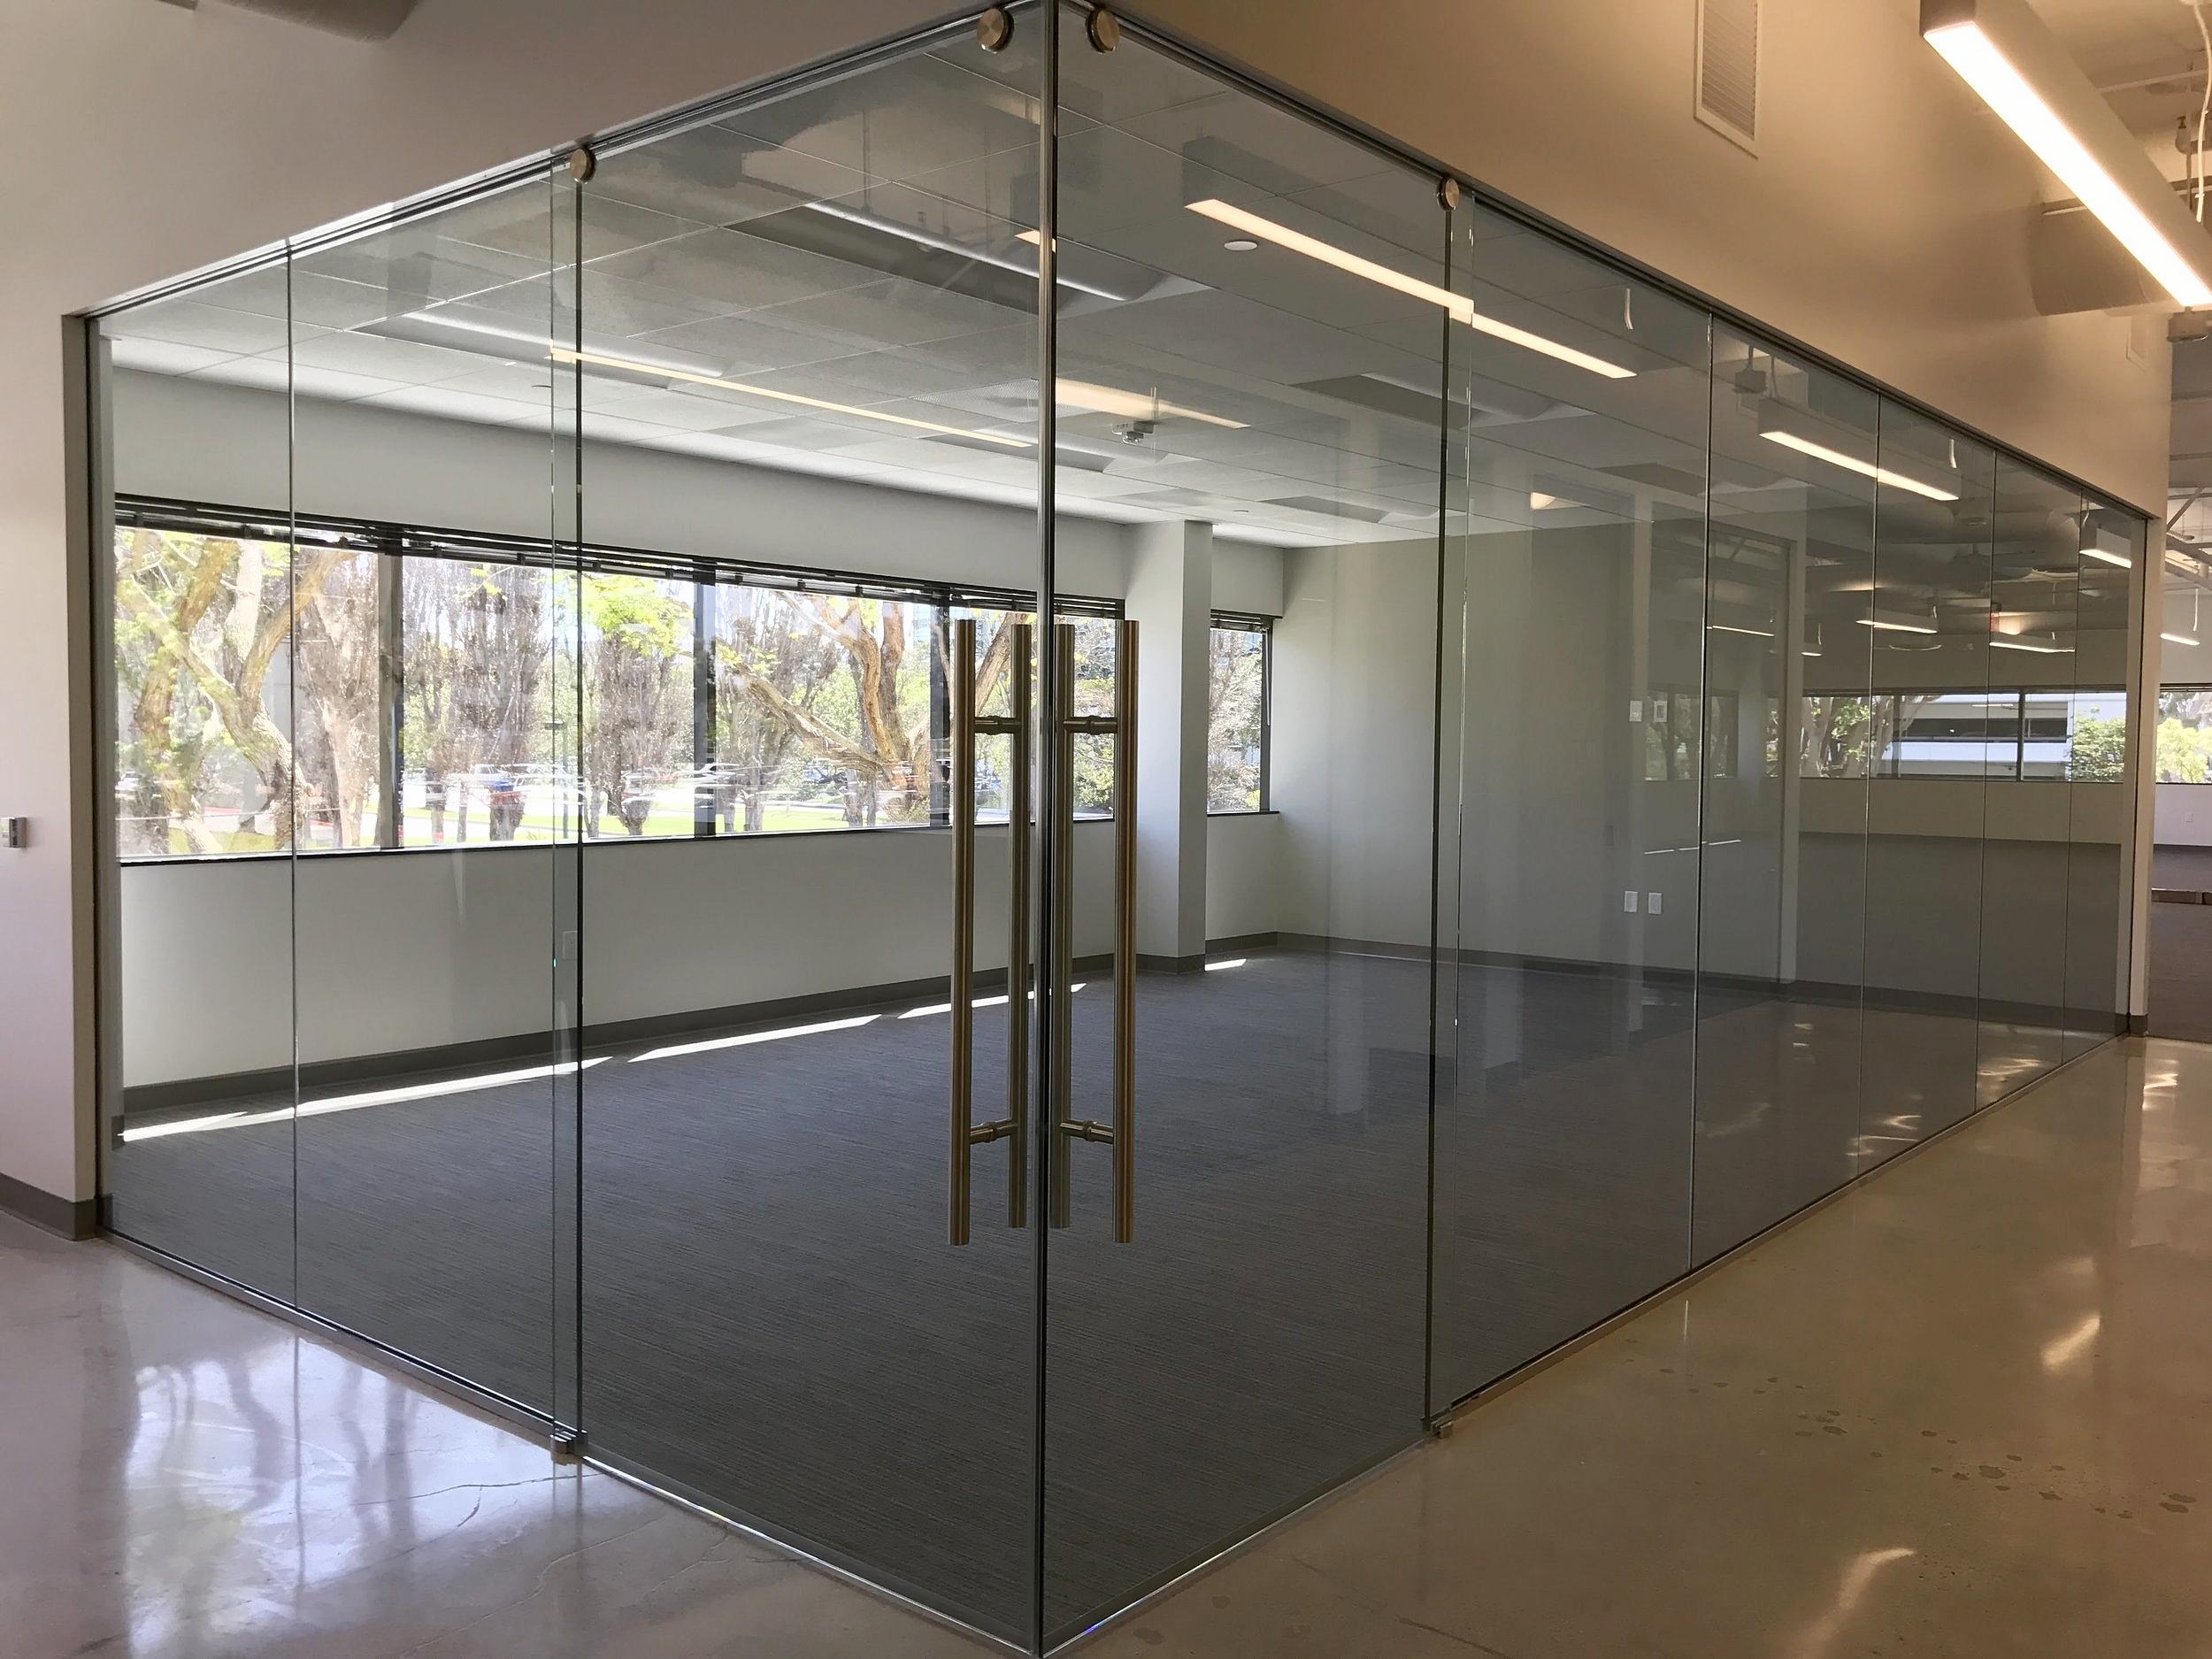 Spec Suite 1060/1065    Client:  Lincoln Property Company West (L.A.)  Architect:  SAA